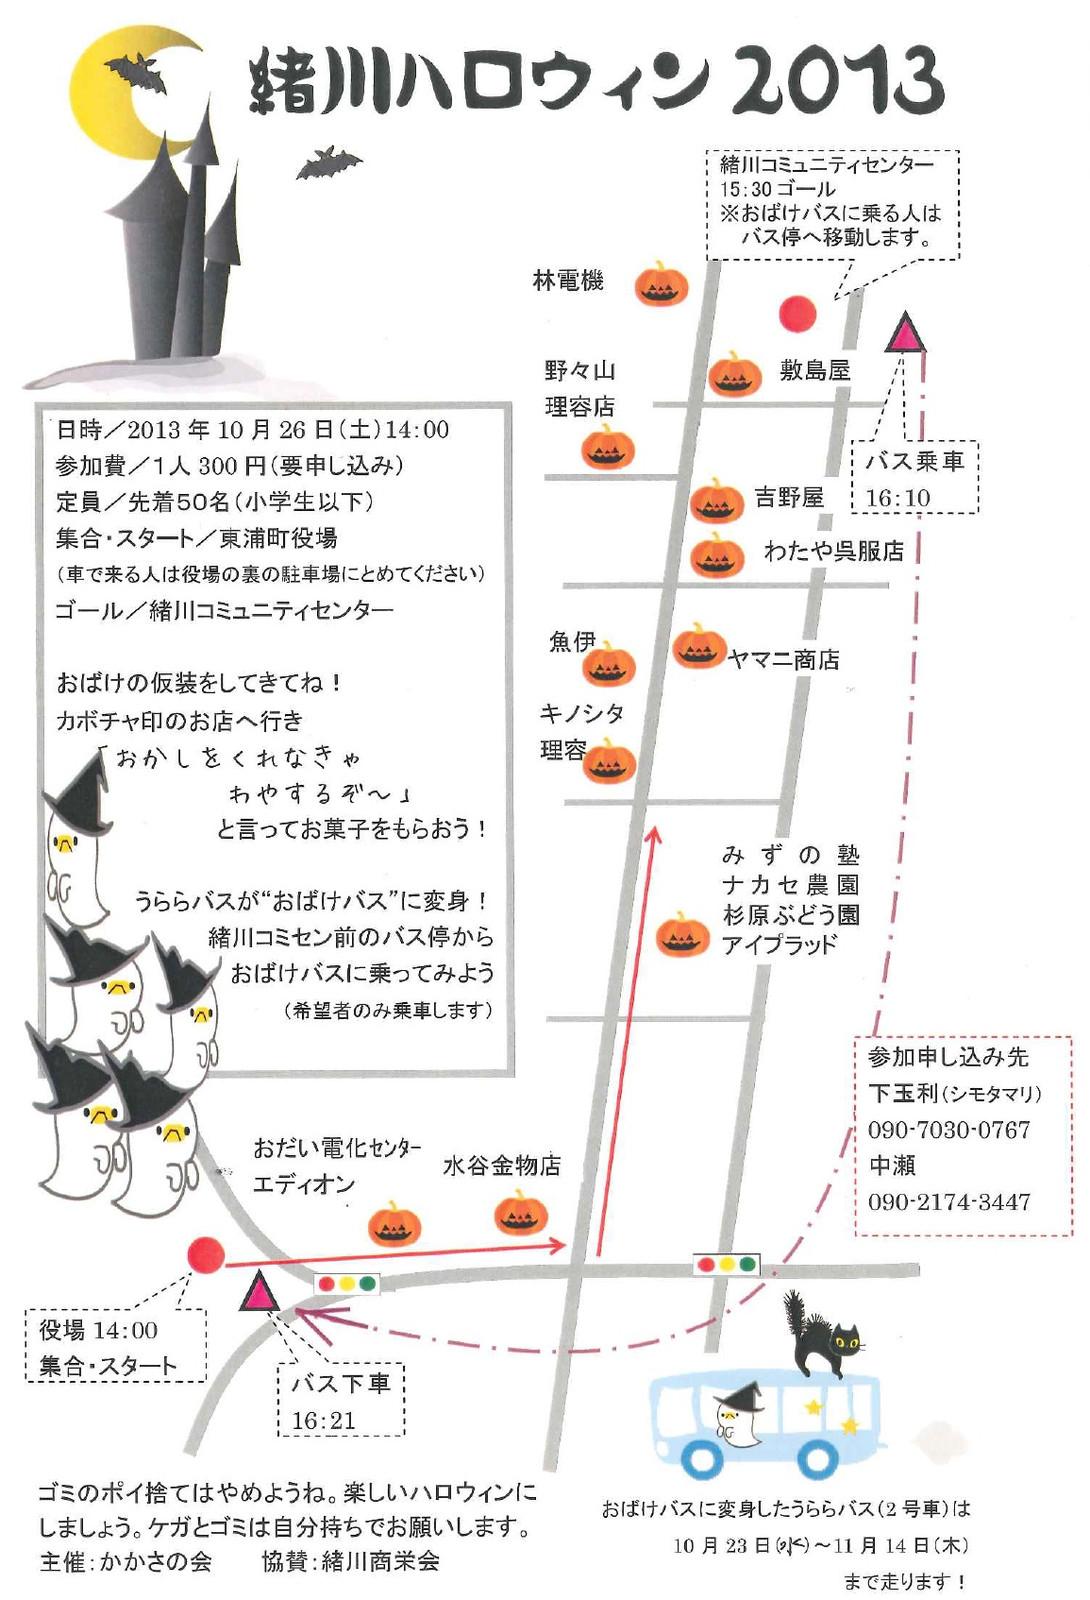 Ogawakabocha20131026